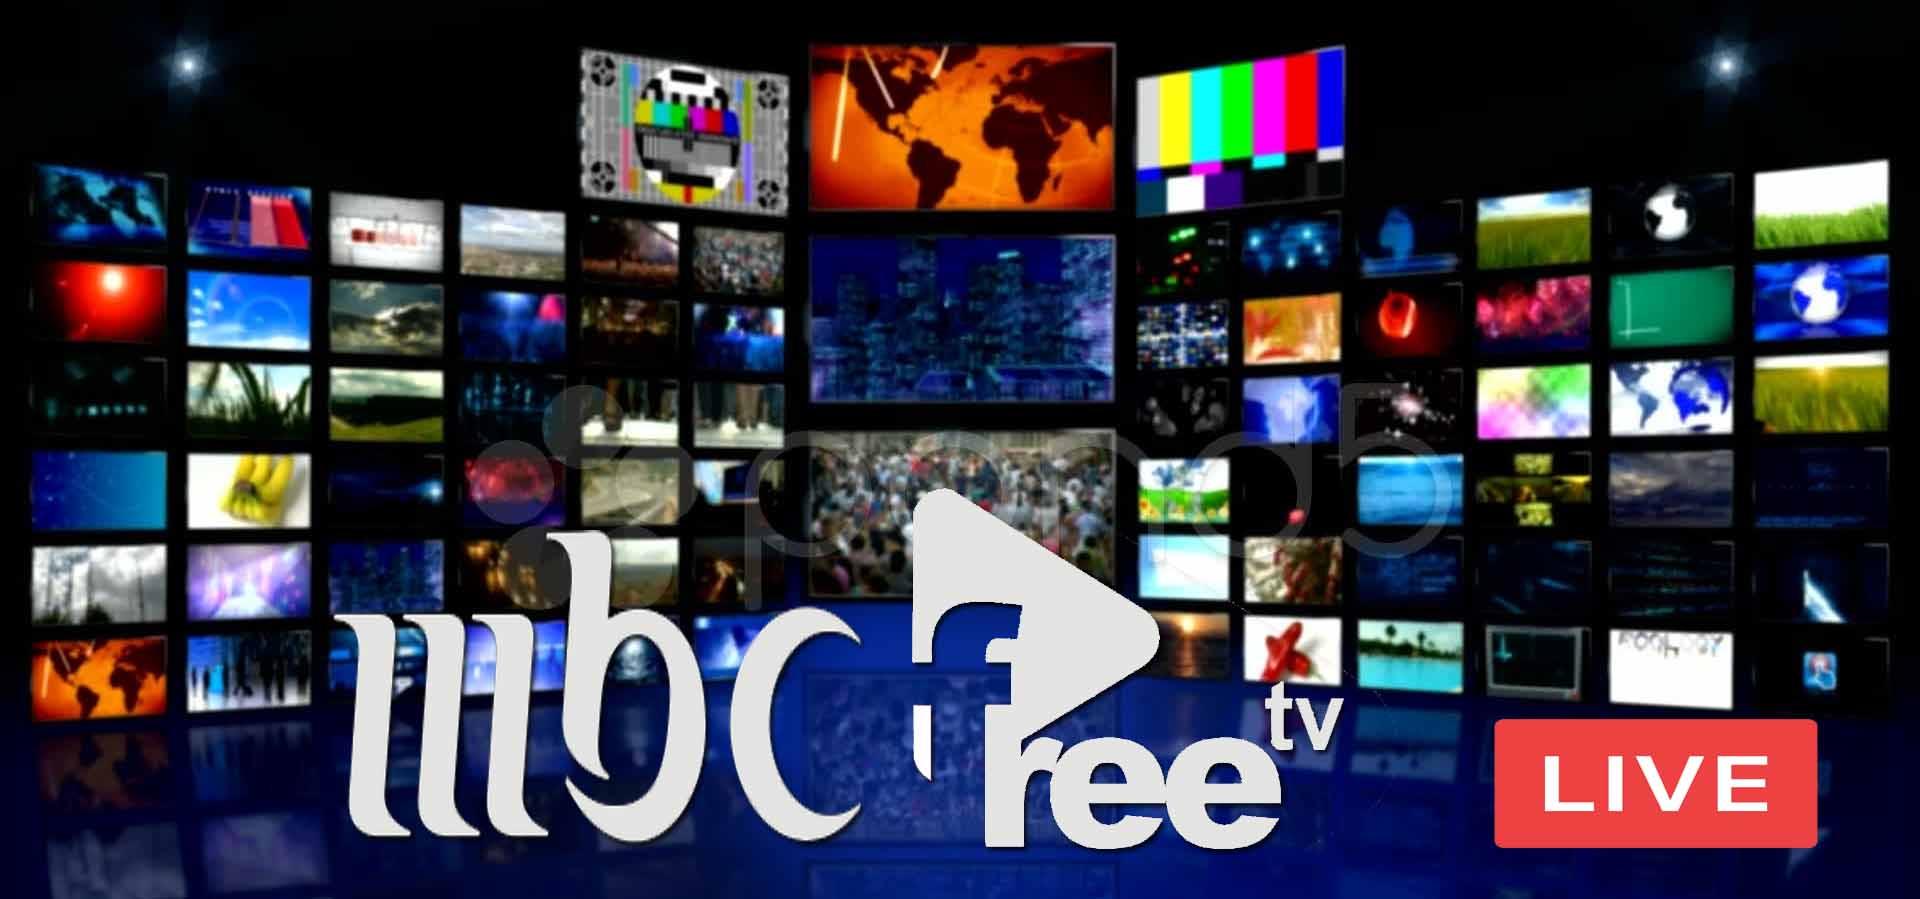 Mbc Free live Tv